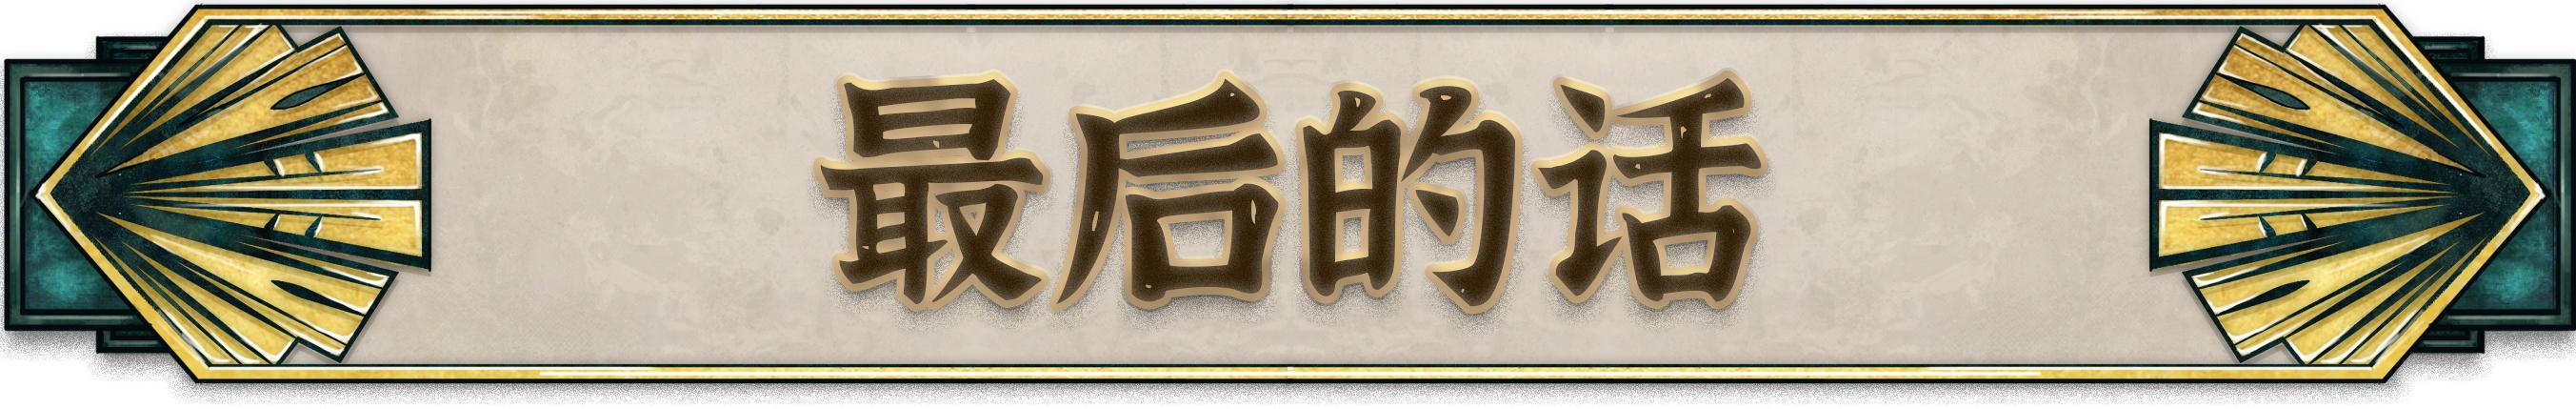 titre-ks-最后的话.jpg